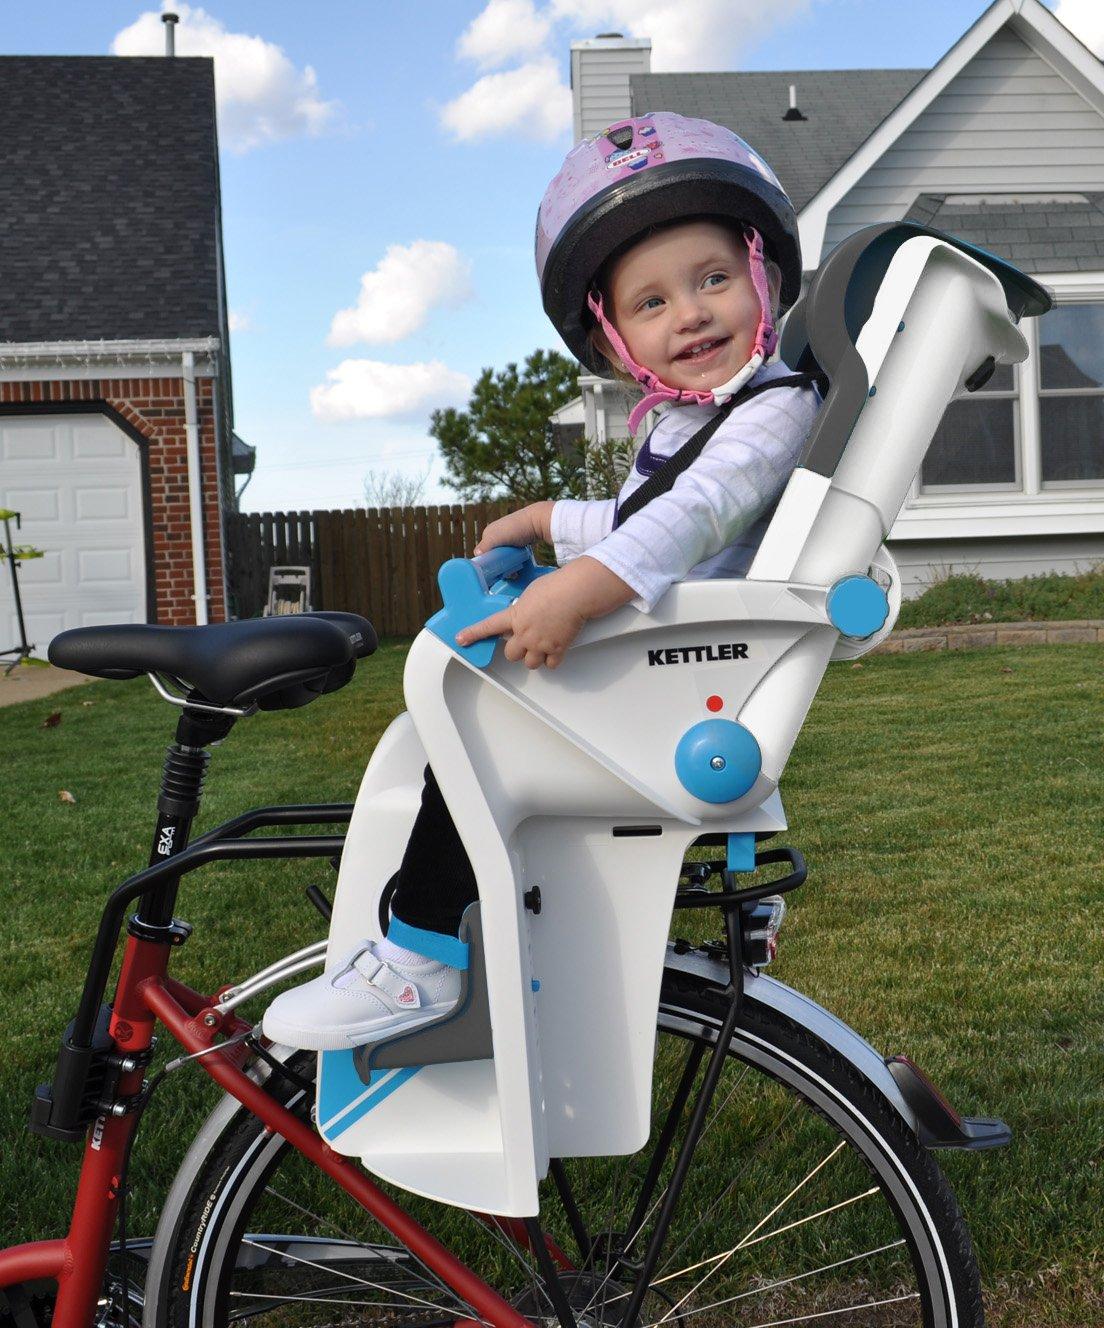 Blue Kettler Flipper Child Bike Seat